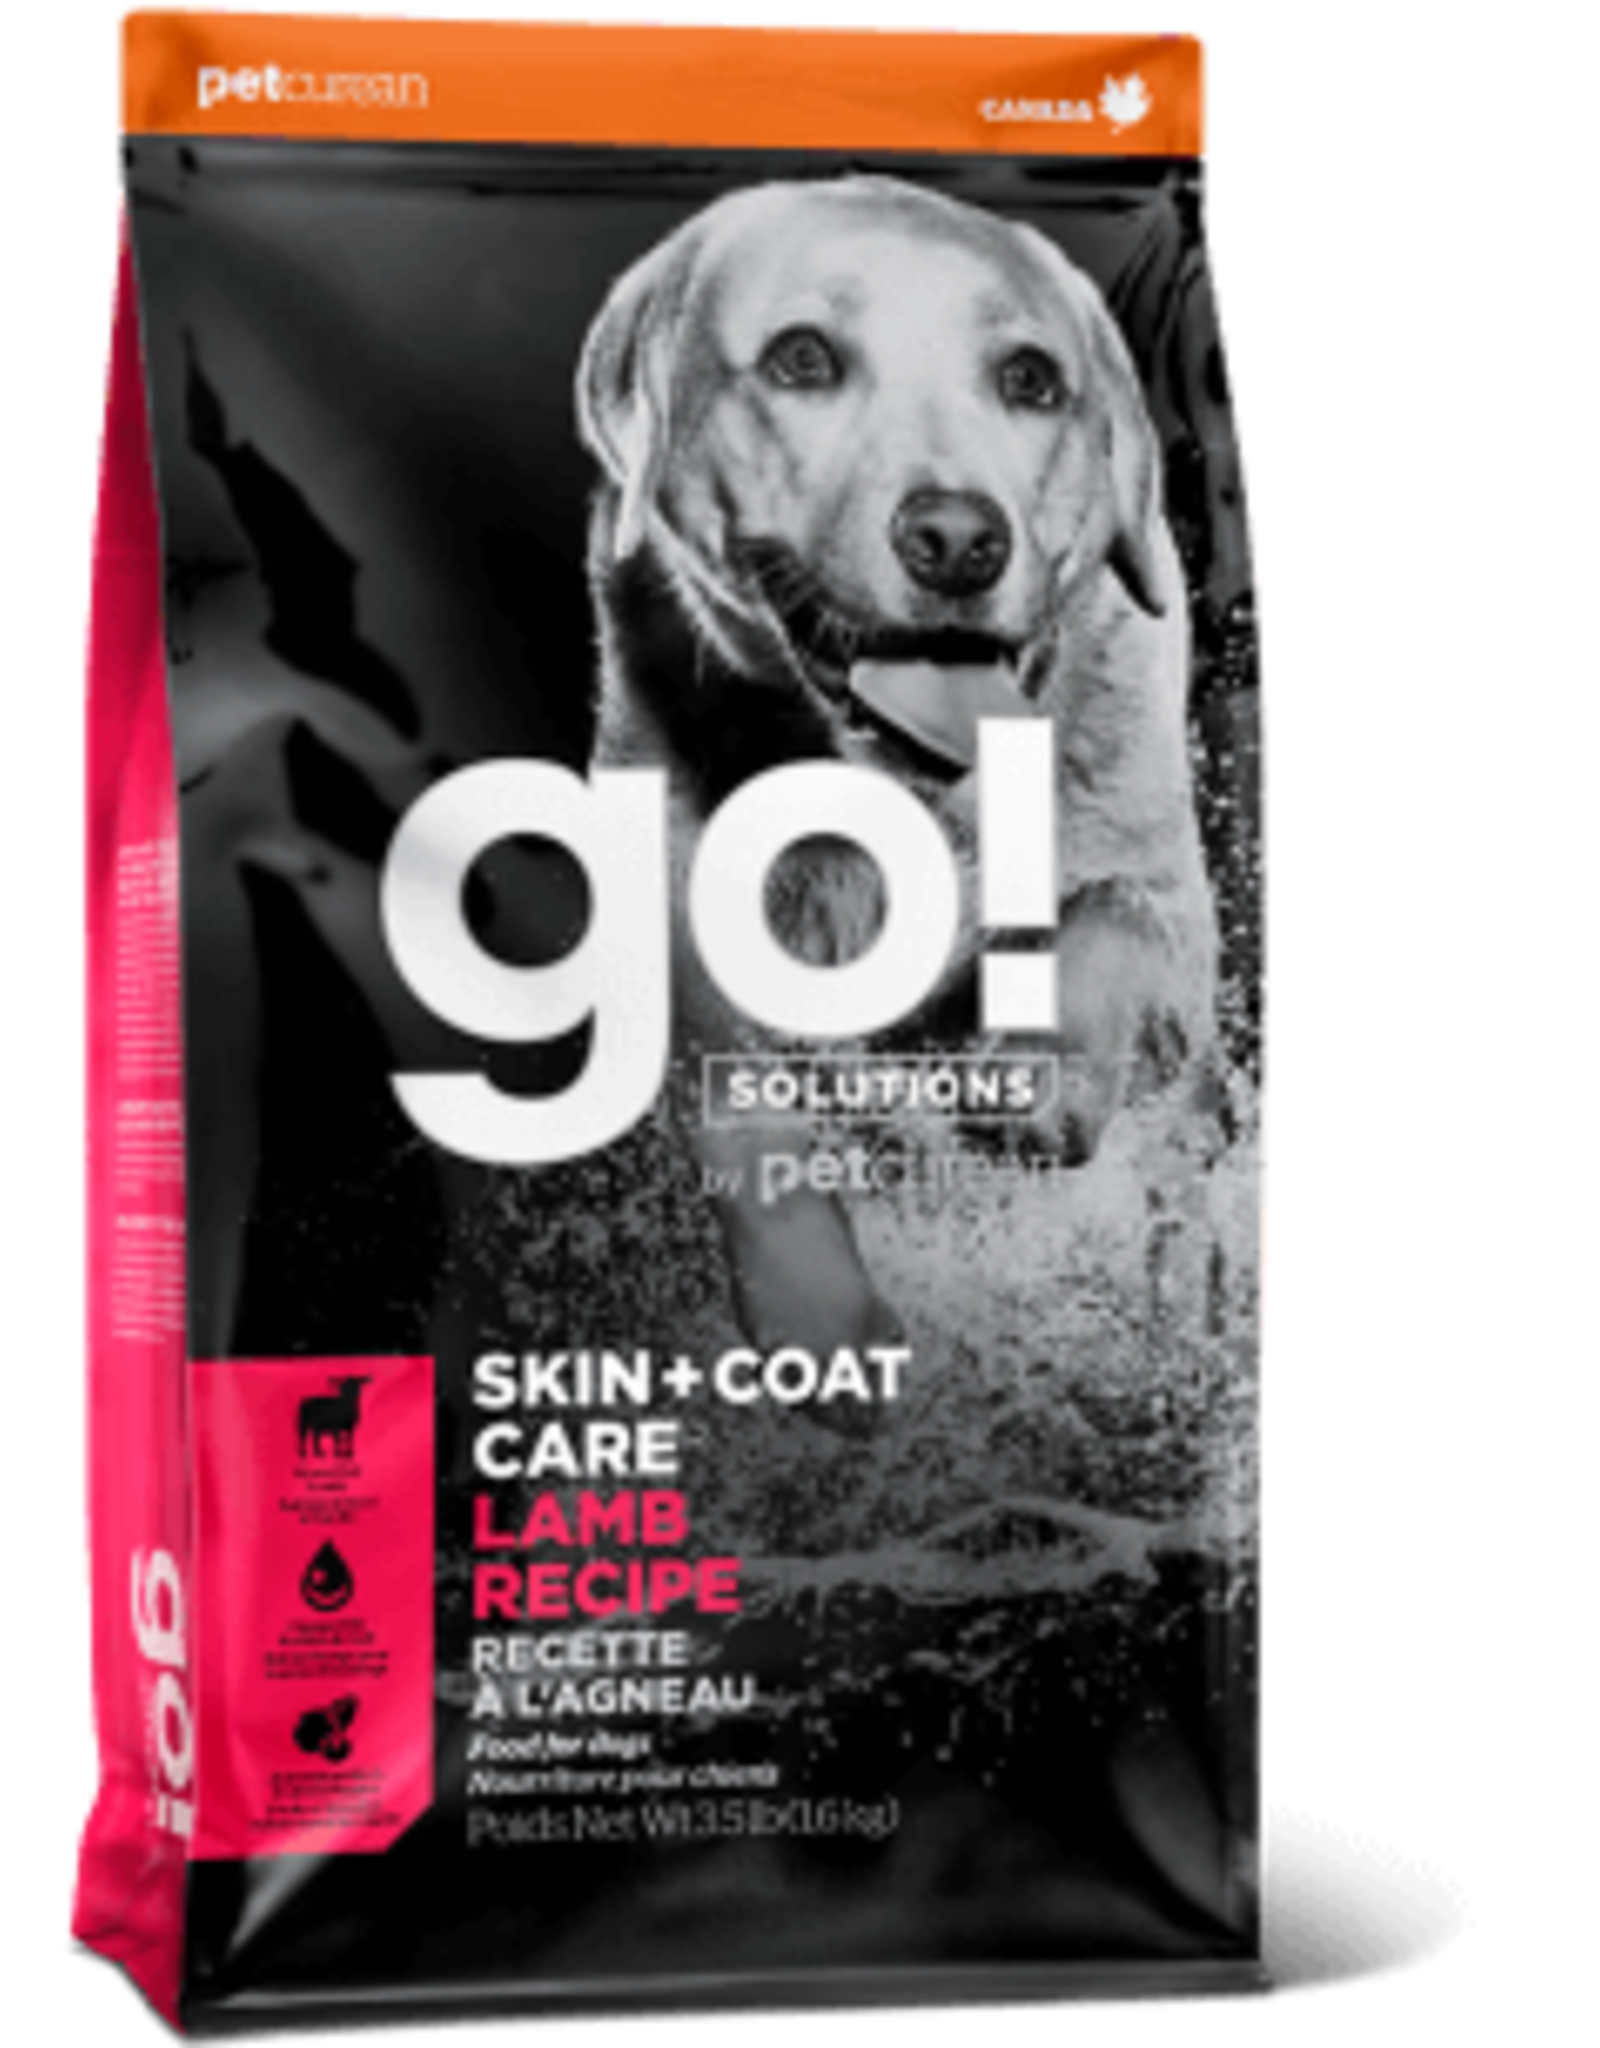 Go! go! Dog Skin & Coat Care Lamb